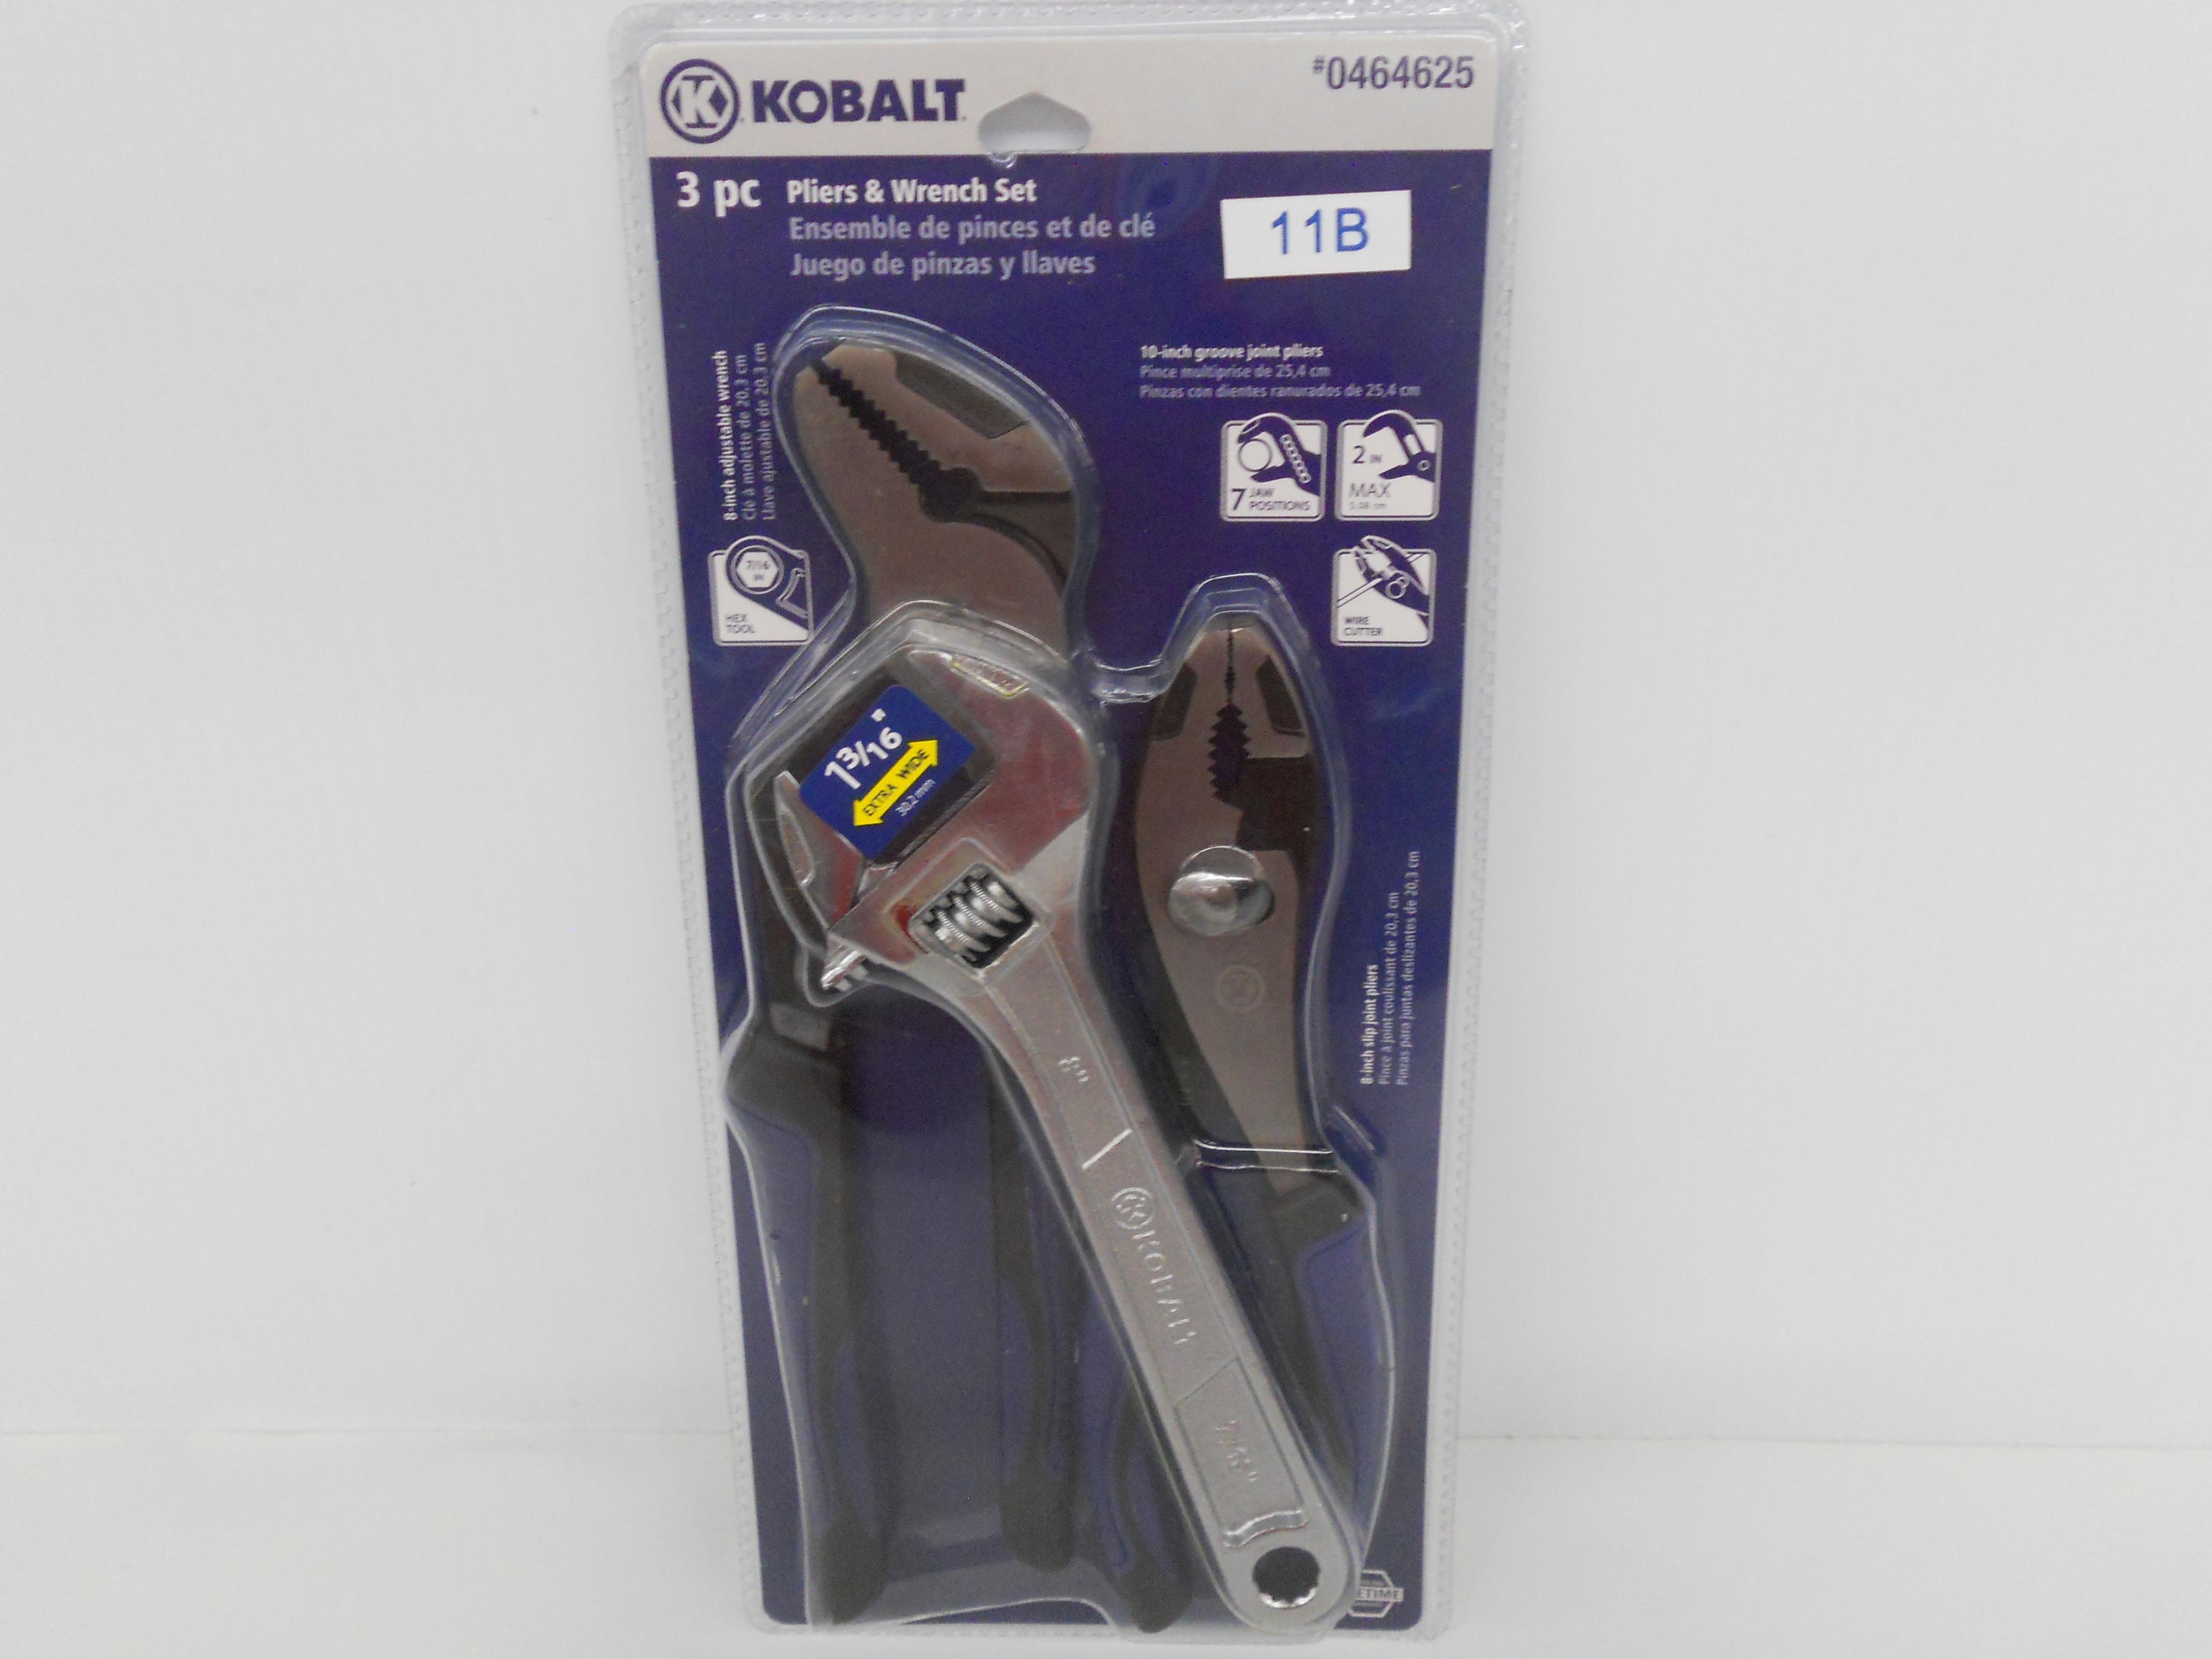 Kobalt 3-piece Plier & wrench set